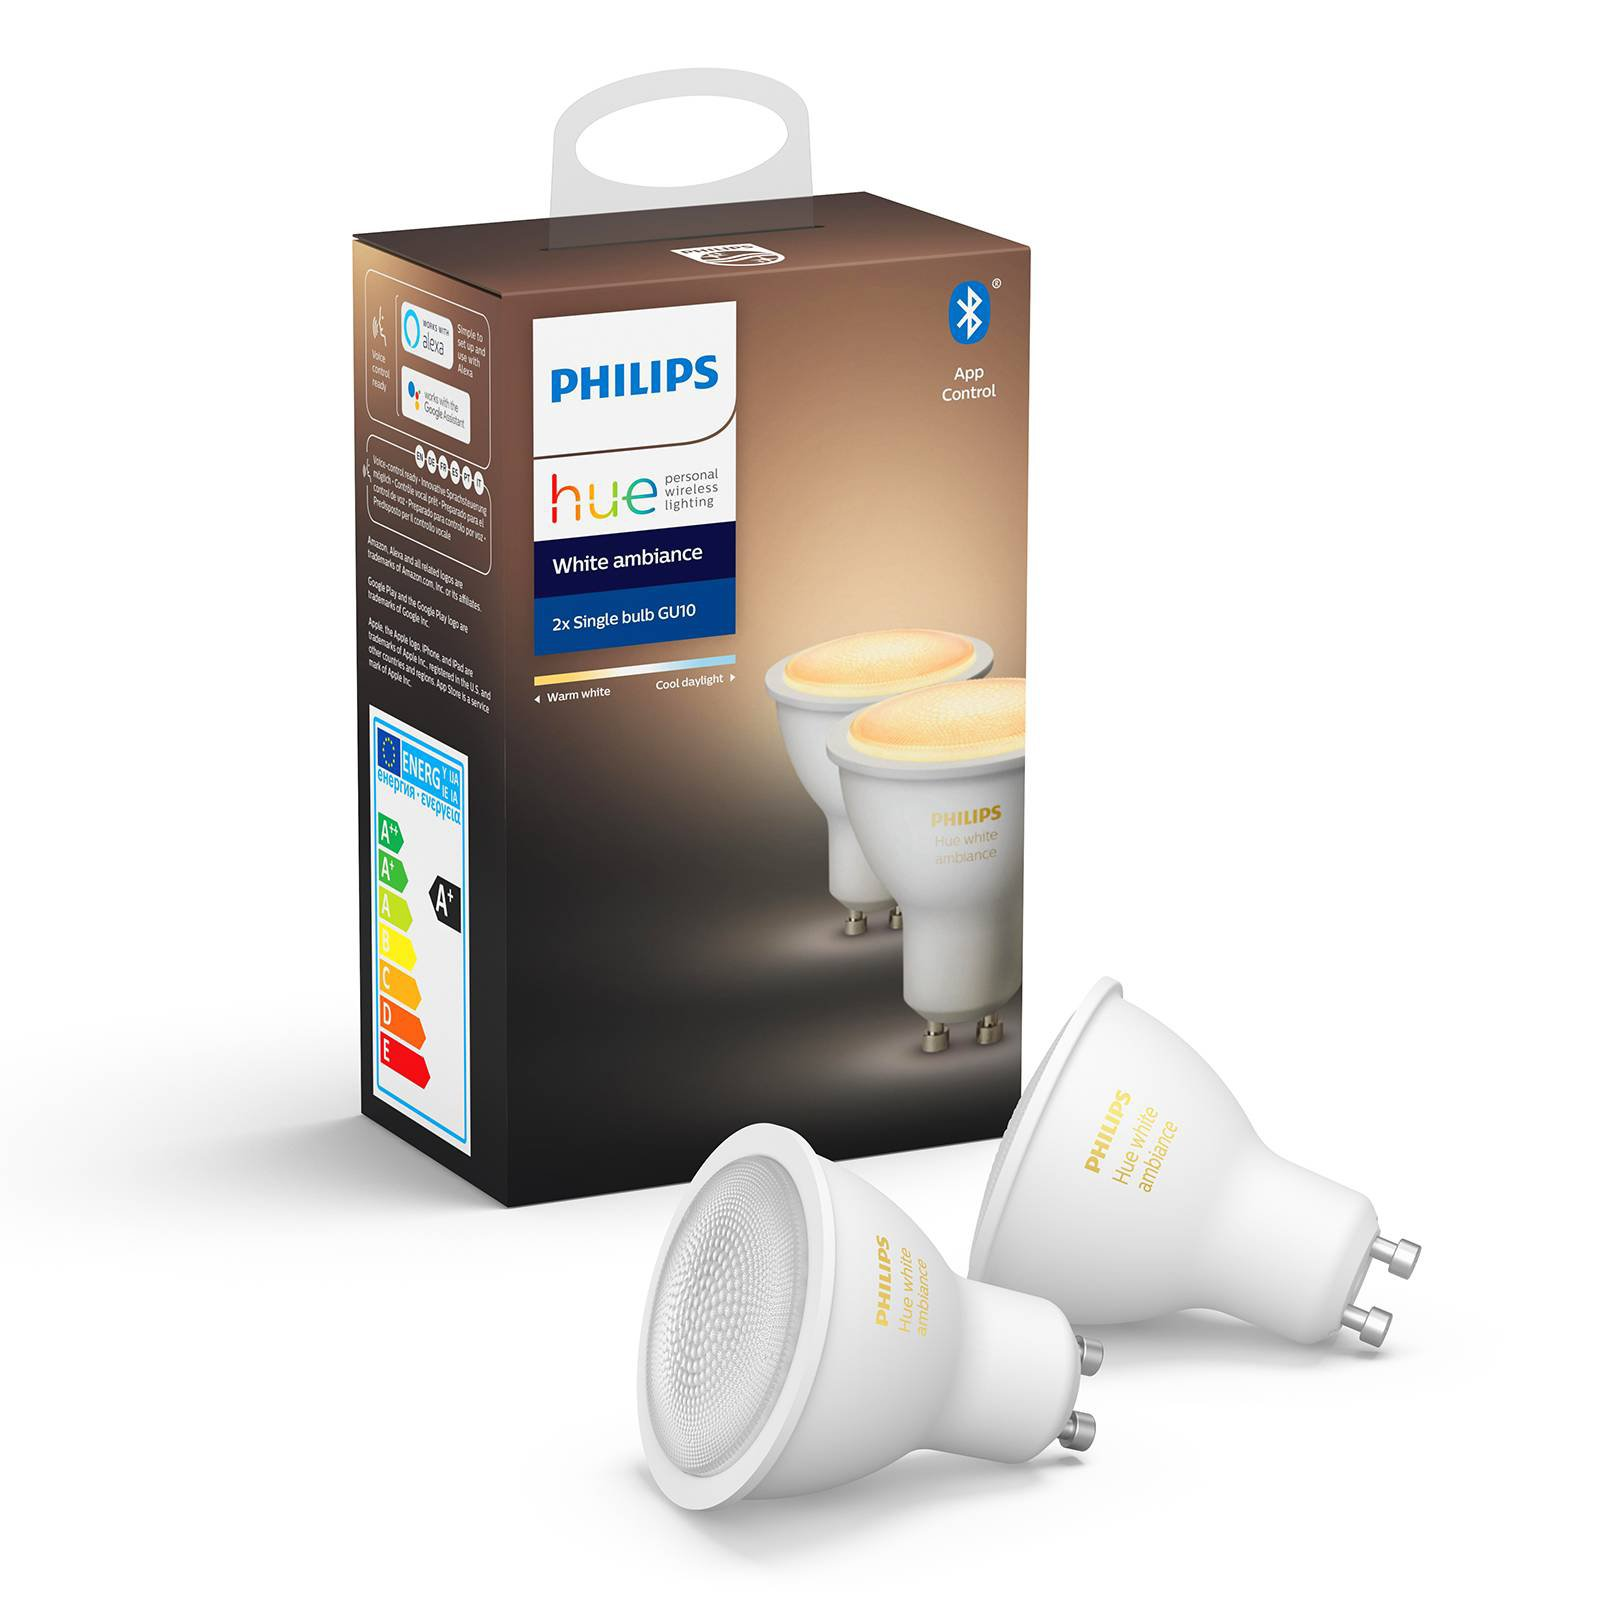 Philips Hue White Ambiance 5 W GU10 LED, 2-pkn